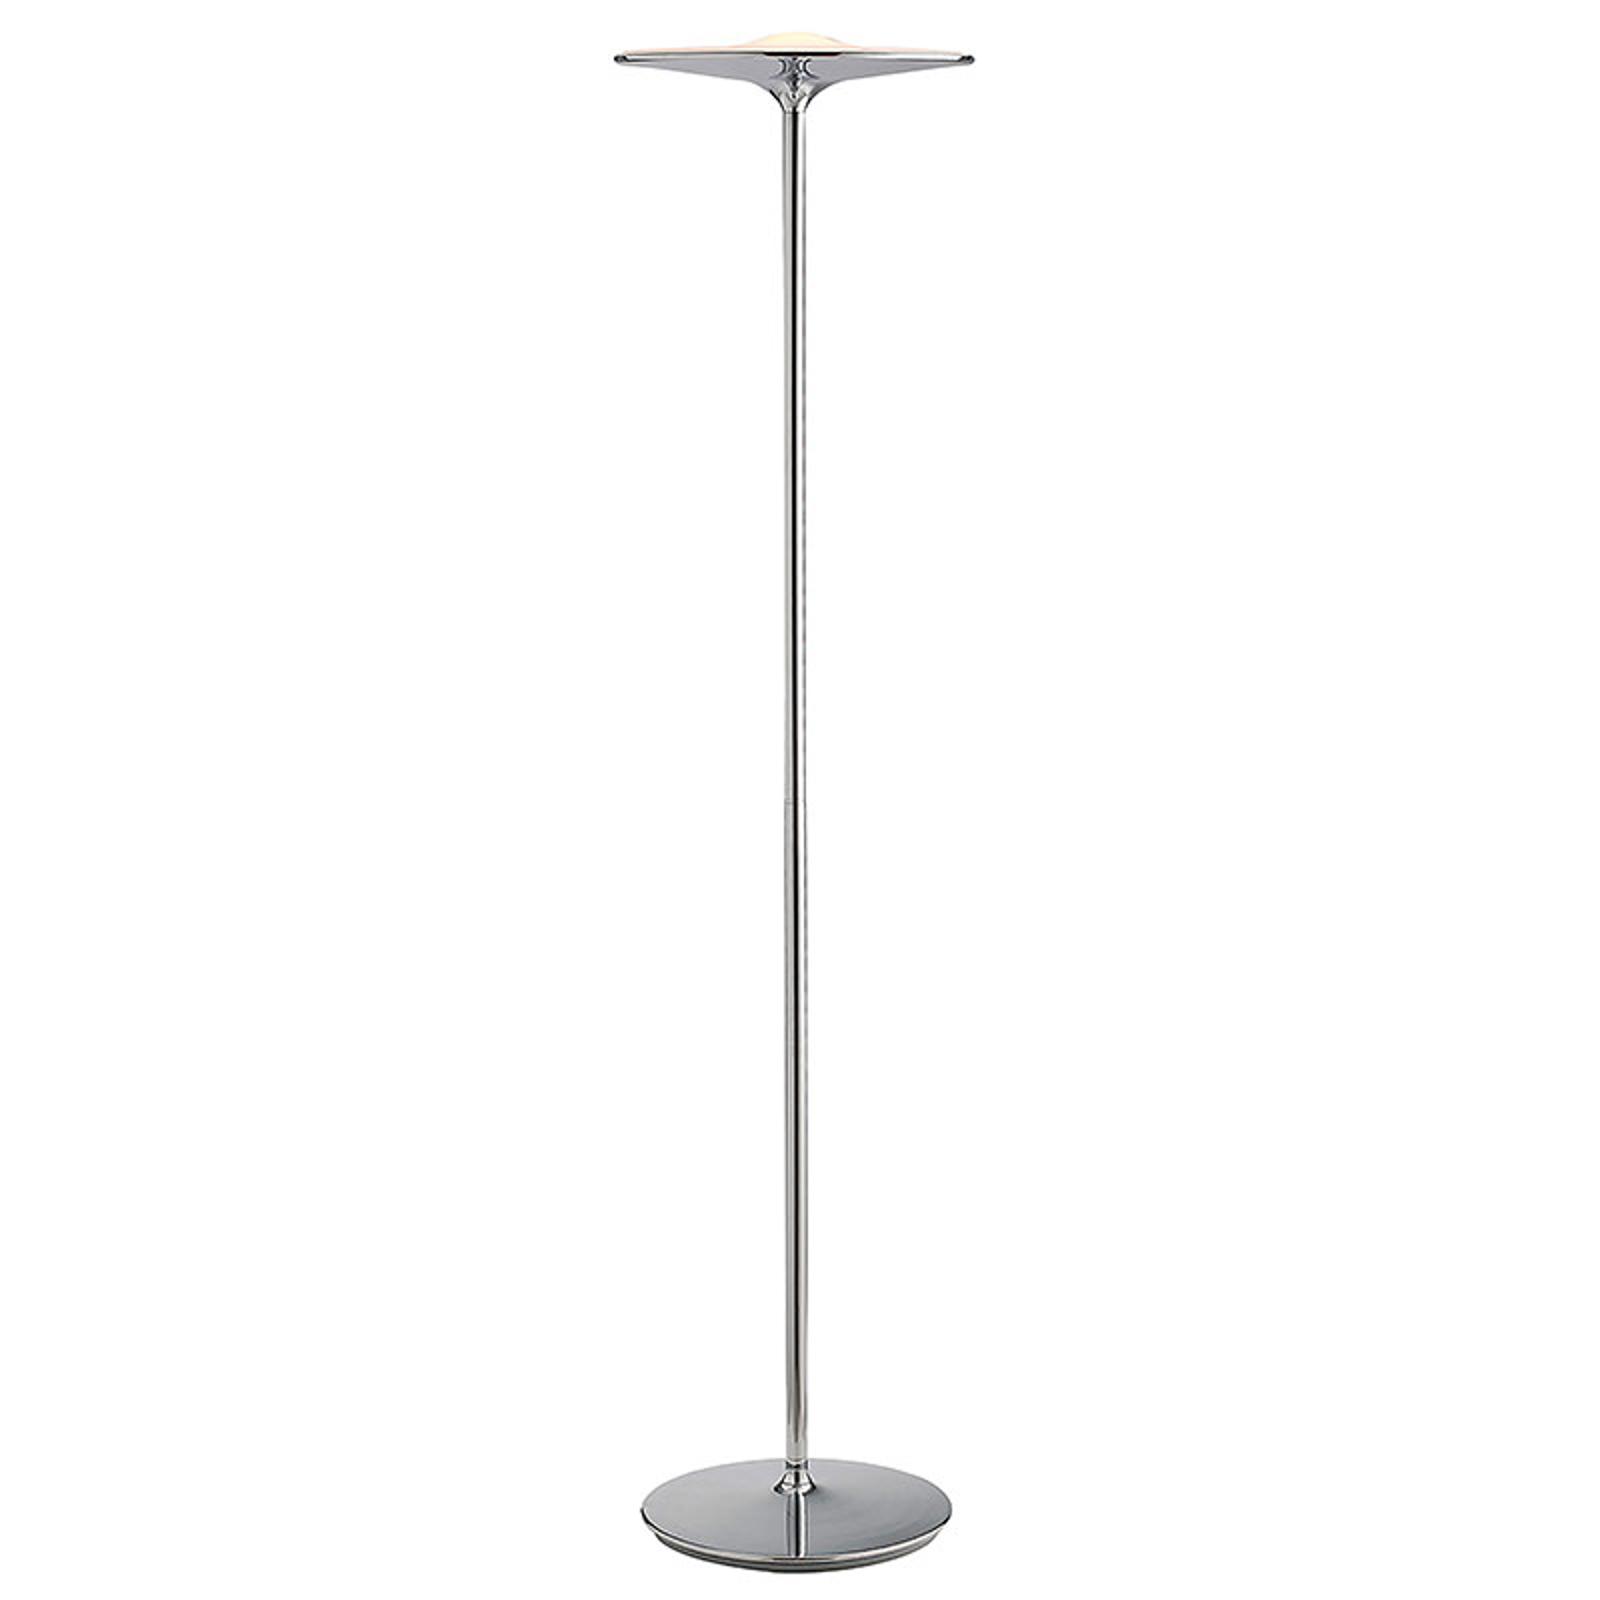 Ikon LED-gulvlampe med kromfinish